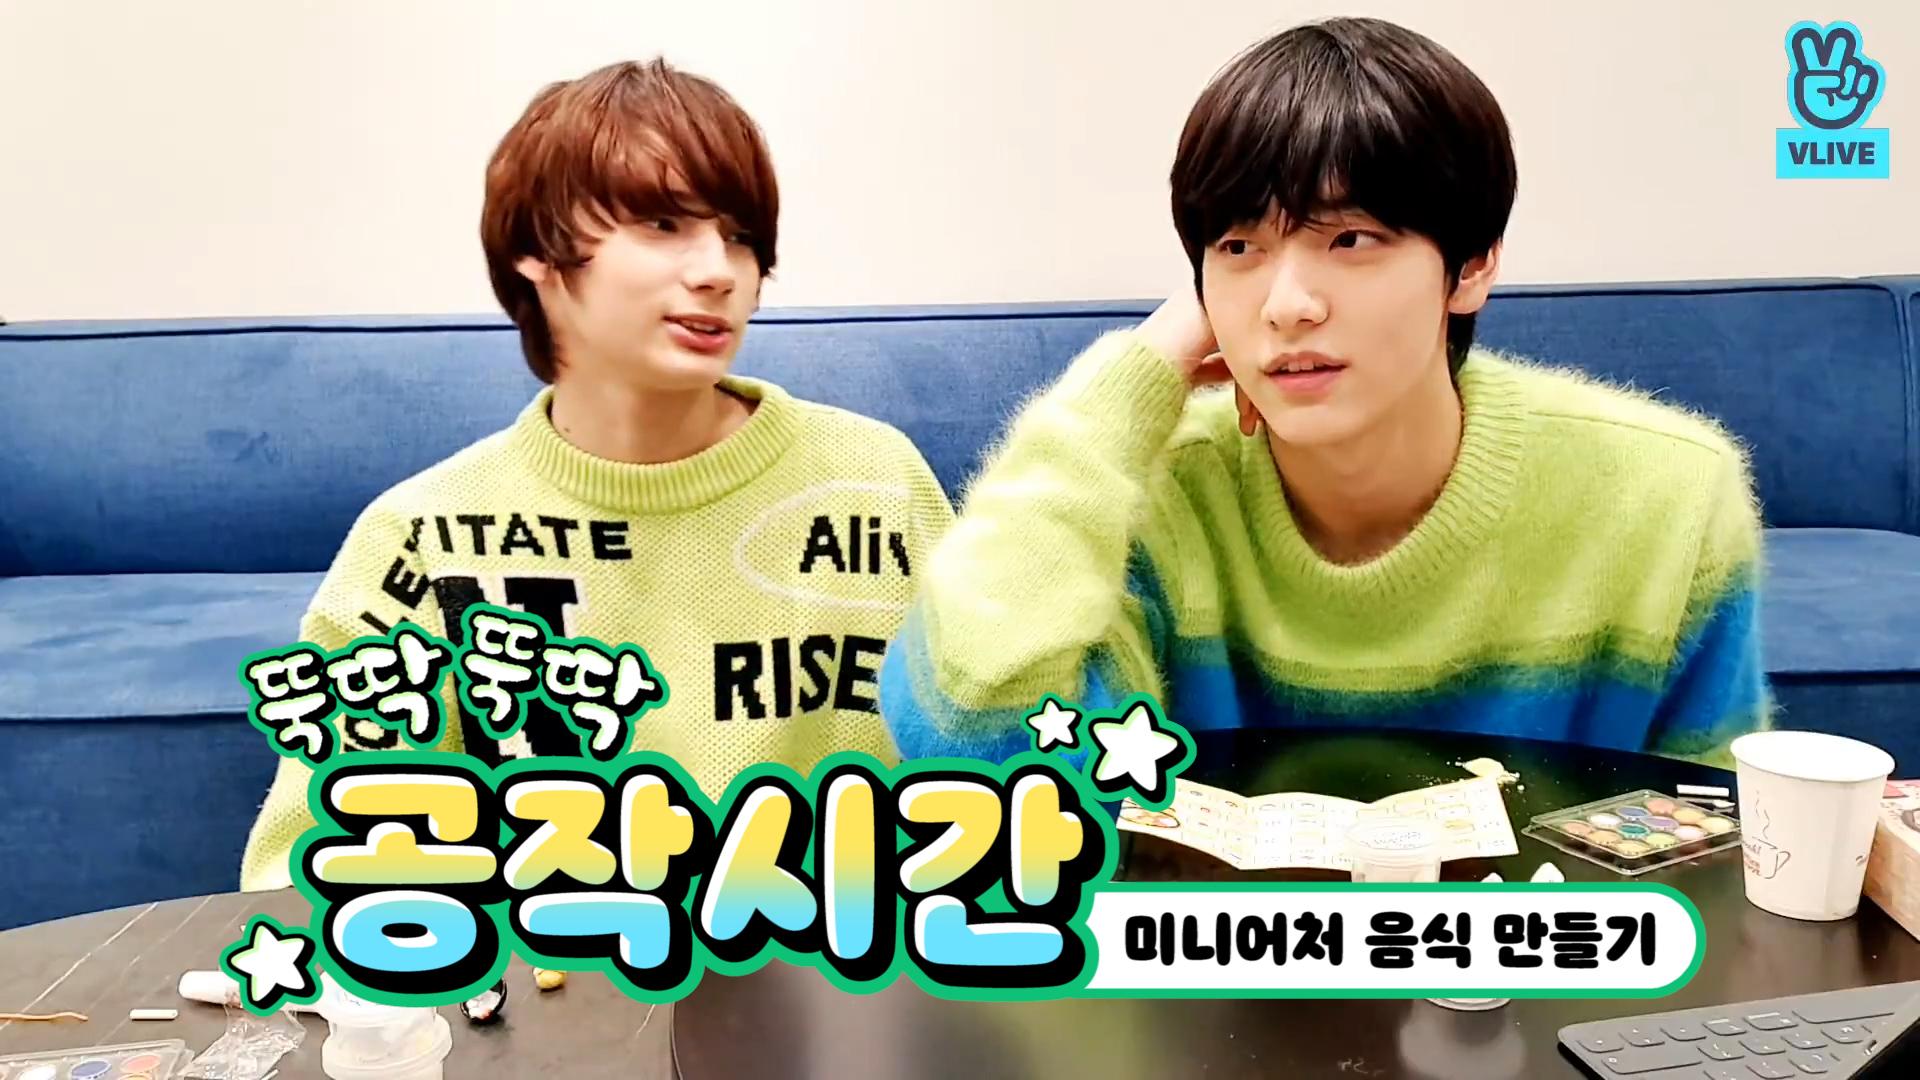 [TXT] YO~ 미니'어처' 만드는 껌딱지즈 '어처'구니 없게 귀엽다 YO~ (SOOBIN&HUENINGKAI making miniature food)